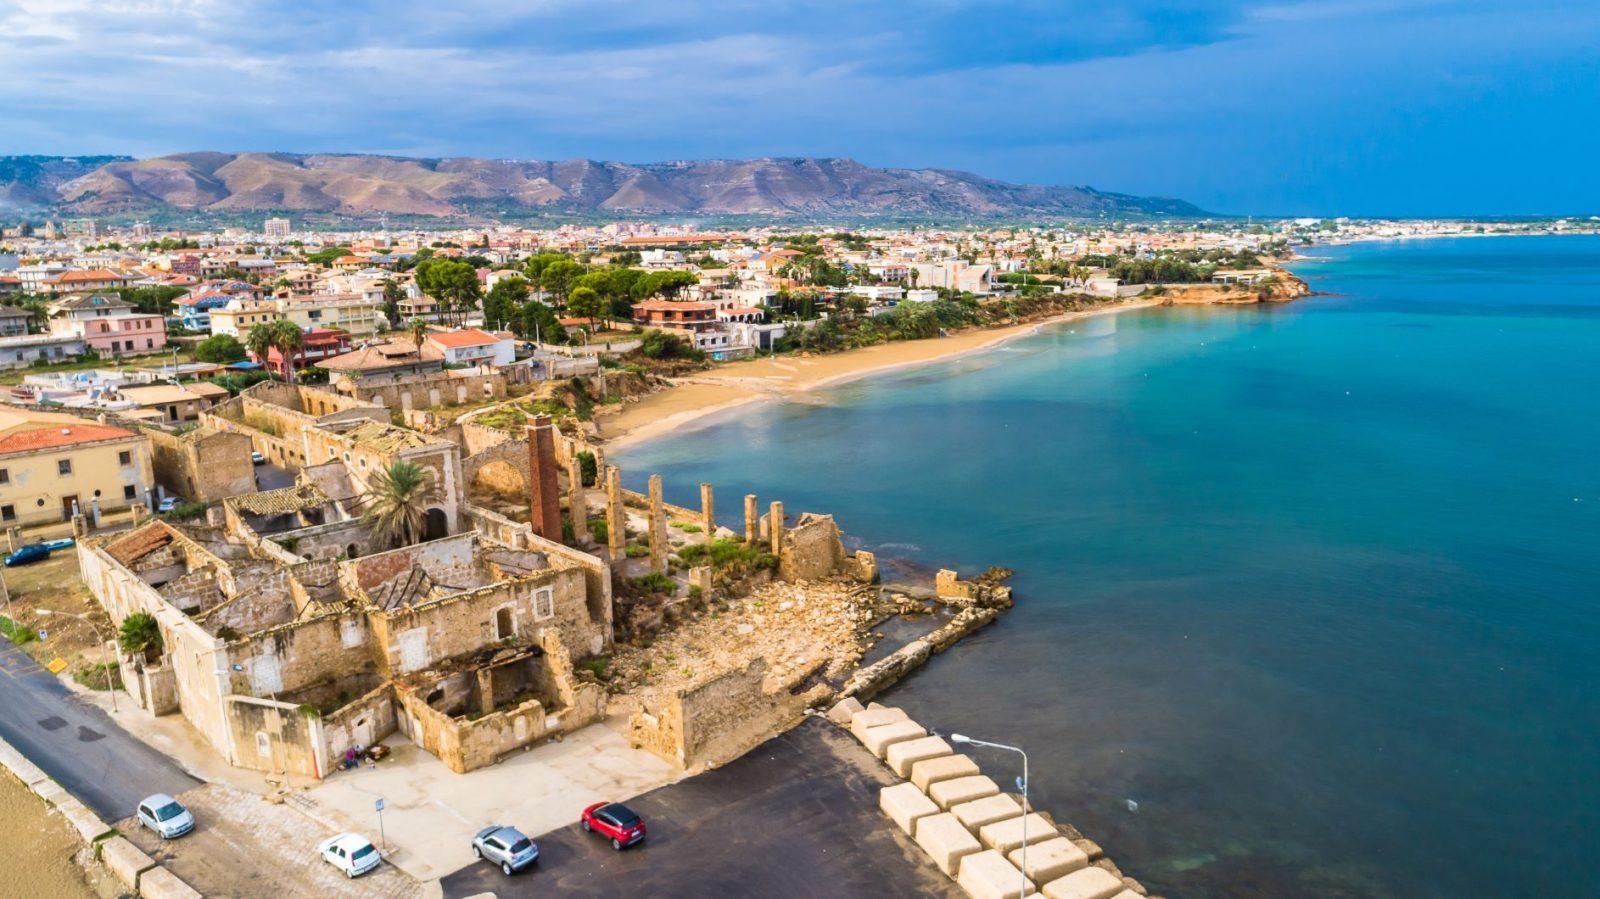 Avola en by på Sicilia